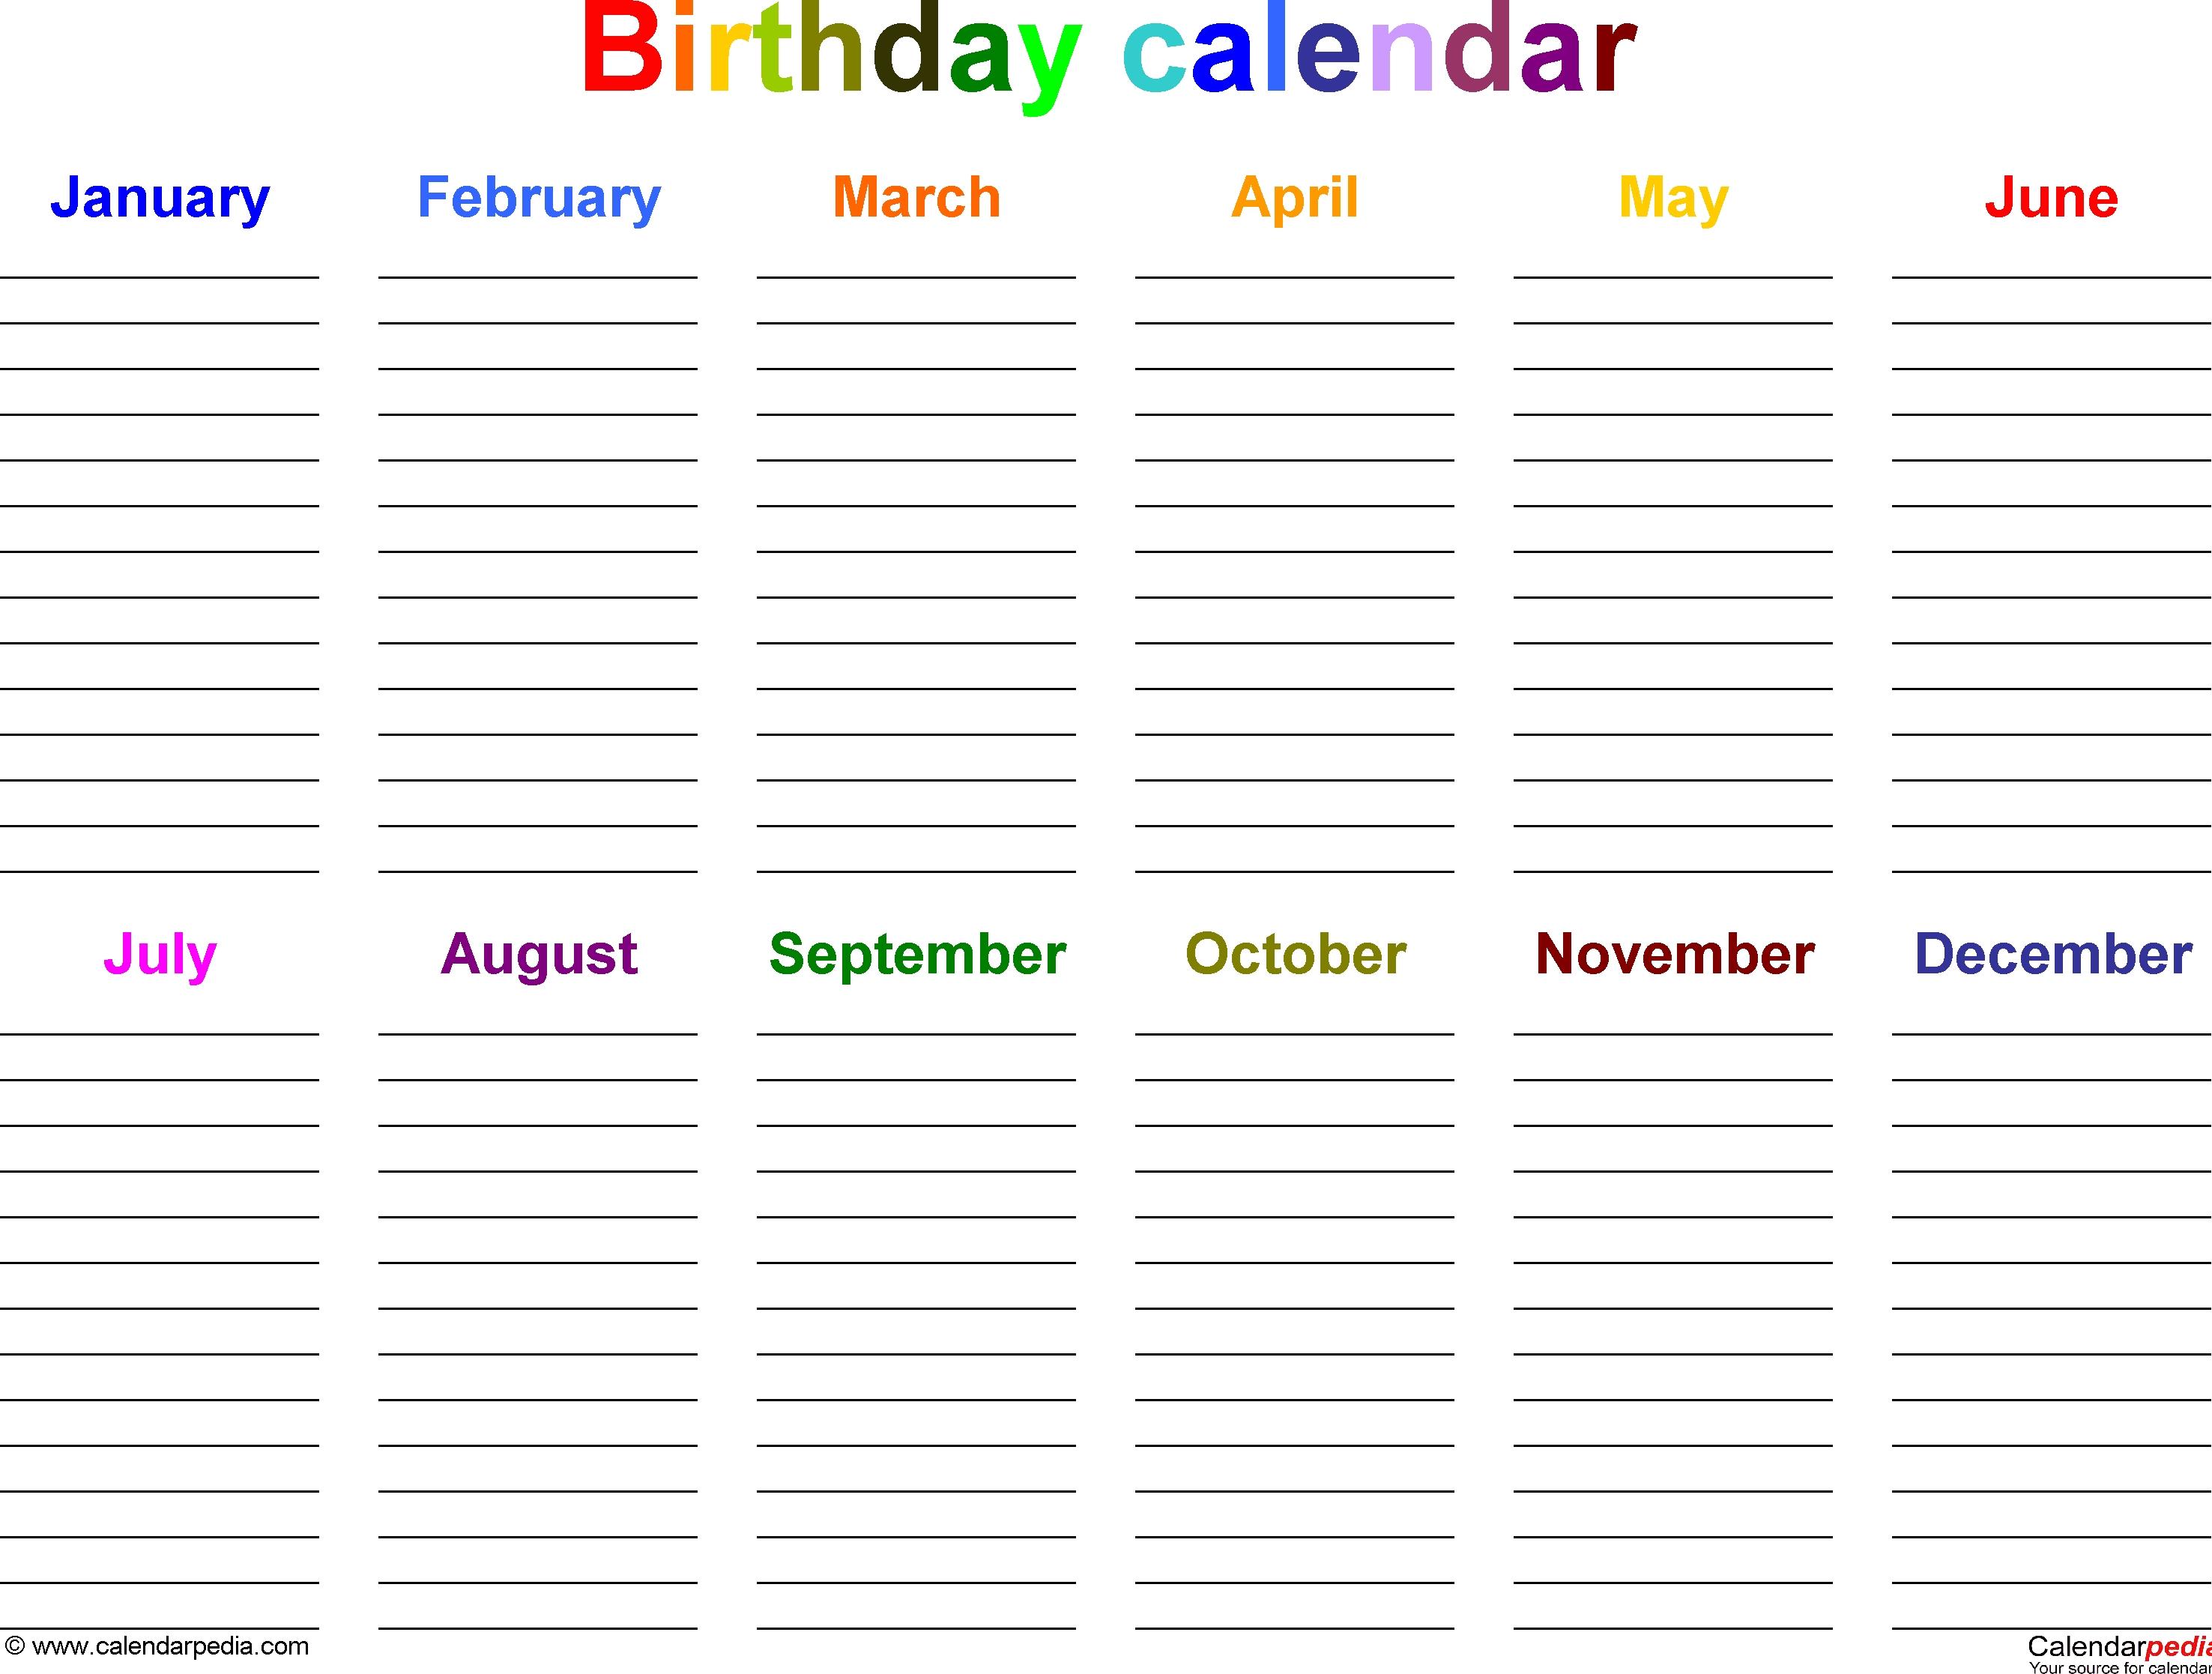 Excel Template For Birthday Calendar In Color (Landscape Orientation regarding Free 12 Month Birthday Calendar Template